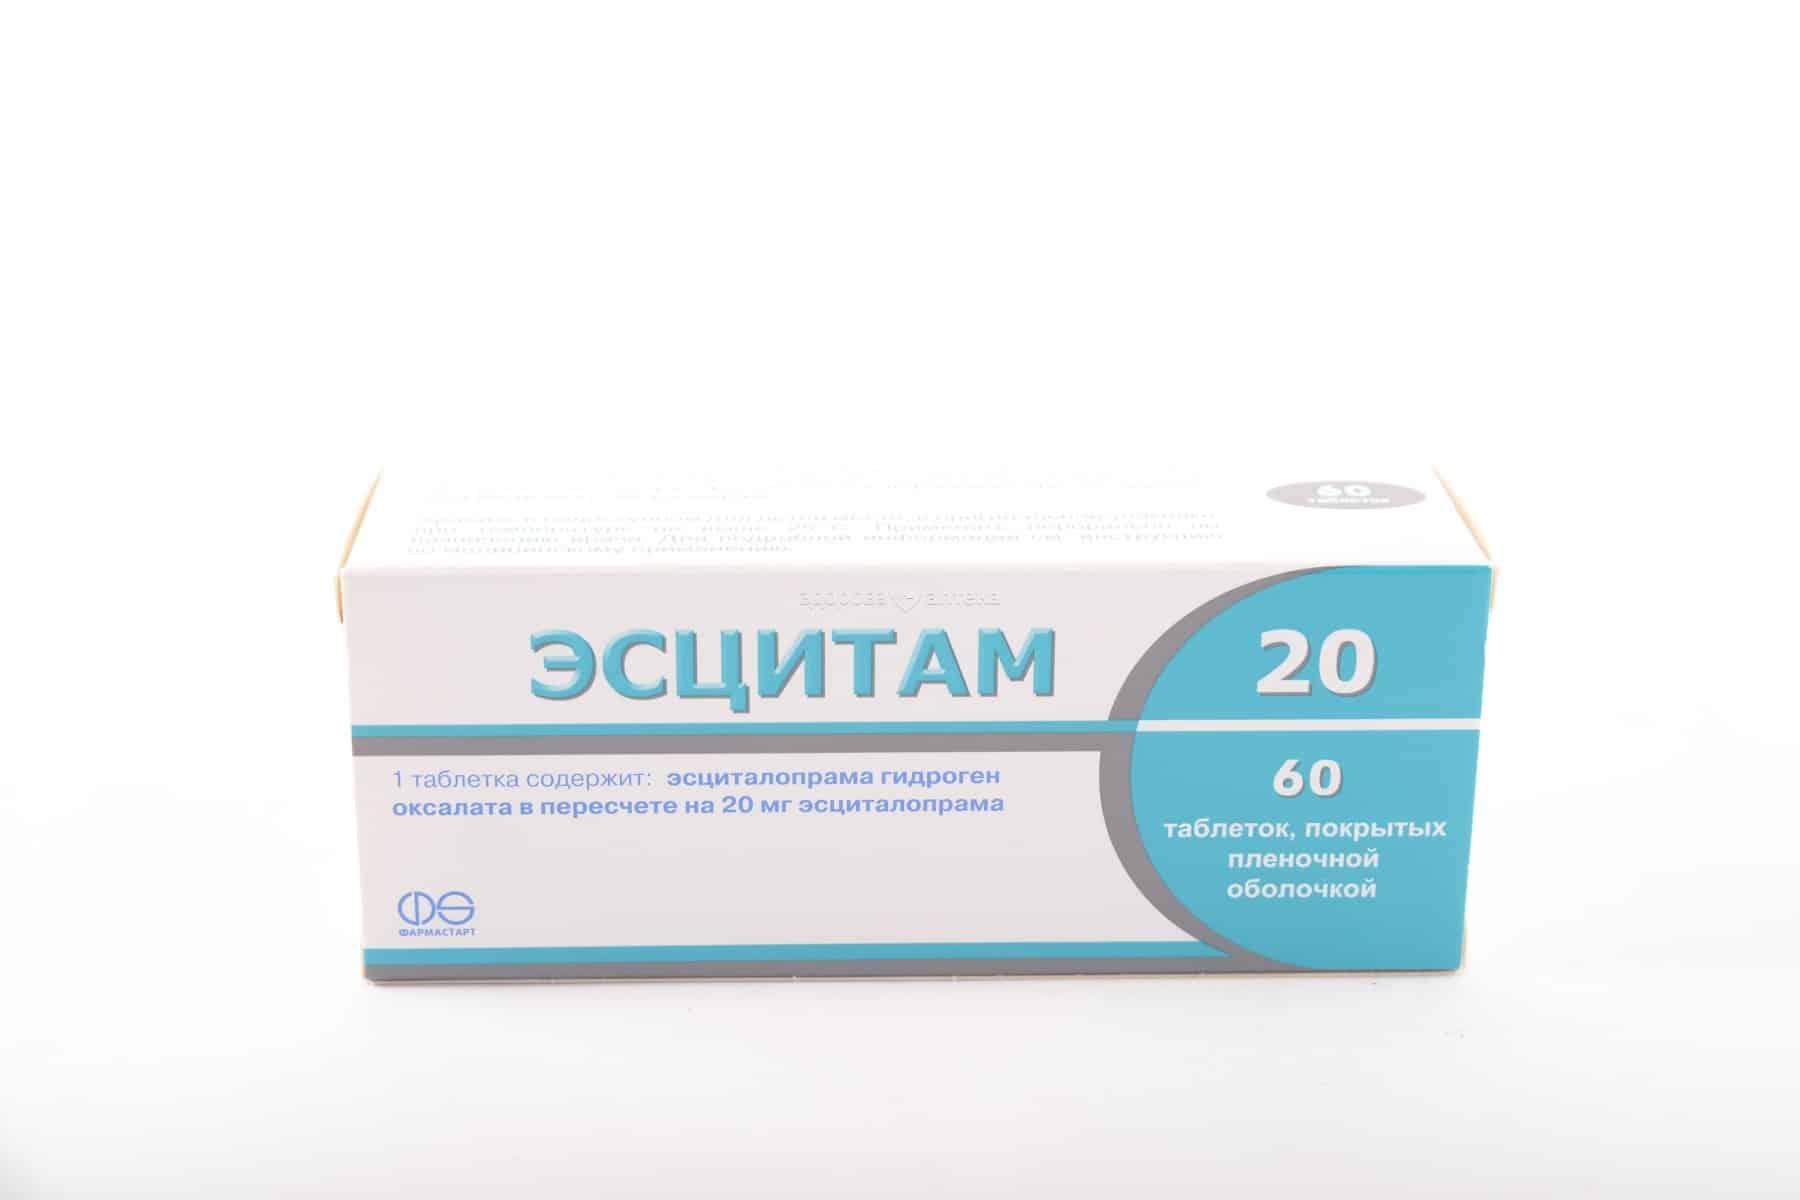 Escitam (escitalopram) 20 coated tablets 20 mg. №60